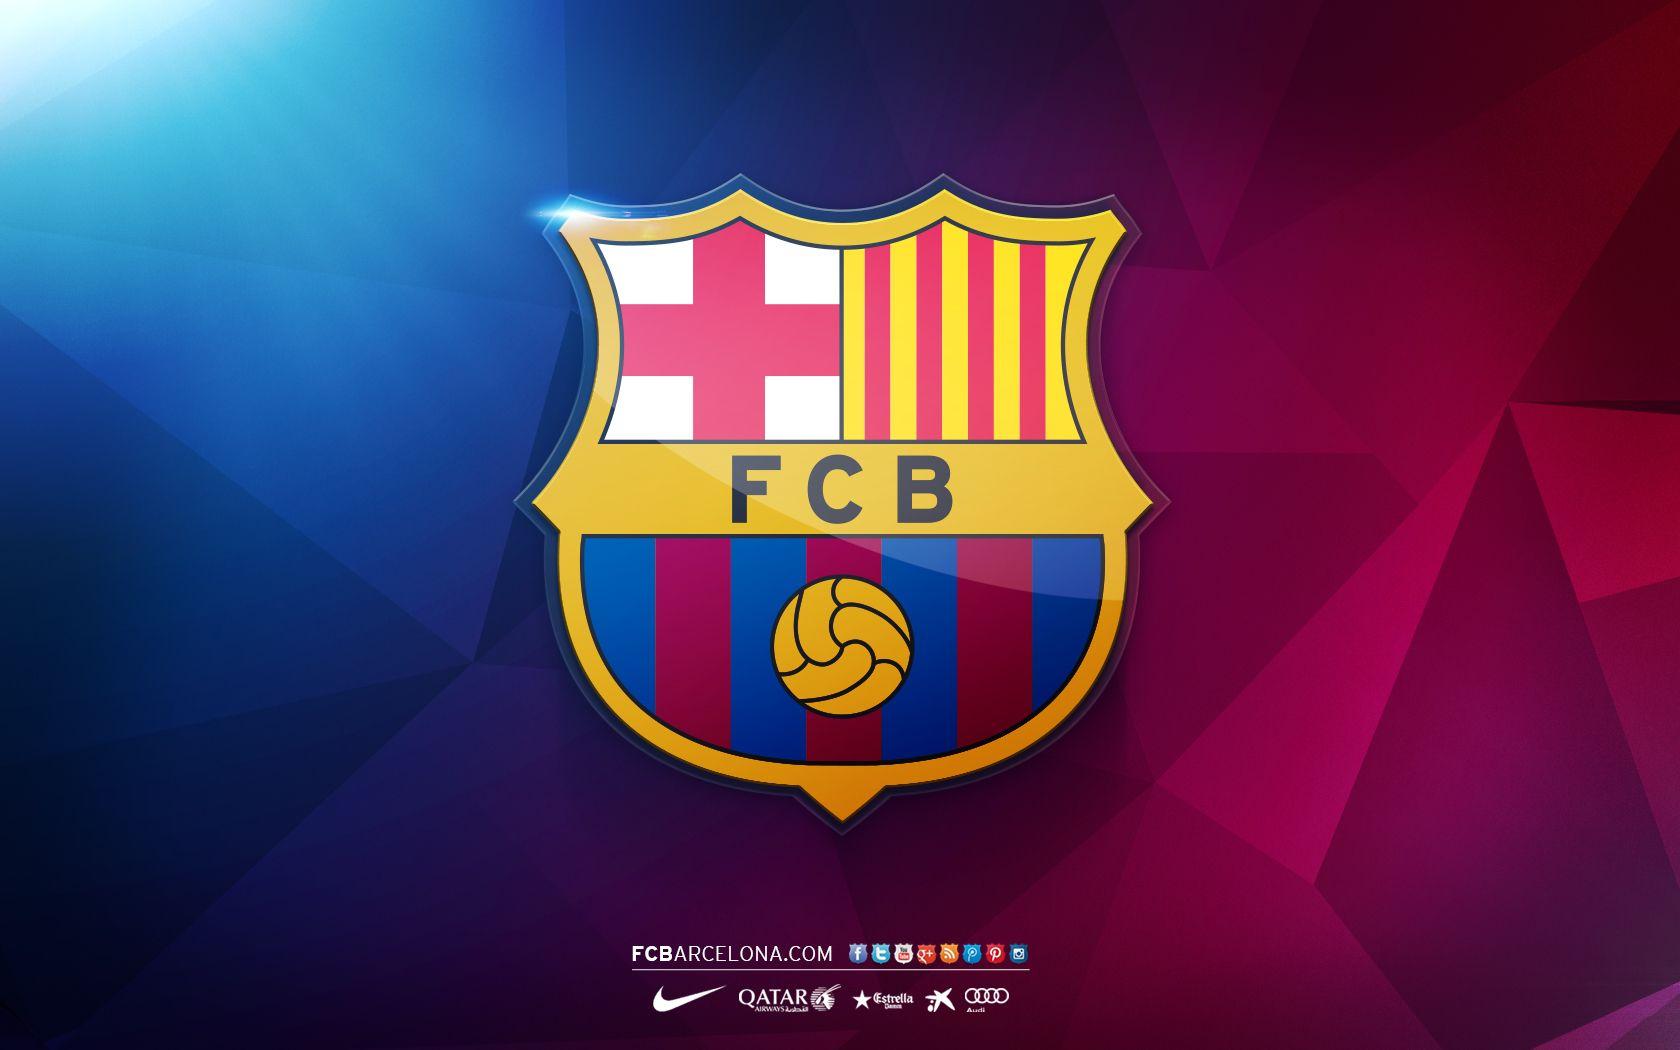 Barca Logo 2015 | Barca Logo Wallpaper | Barca Logo Hd ...